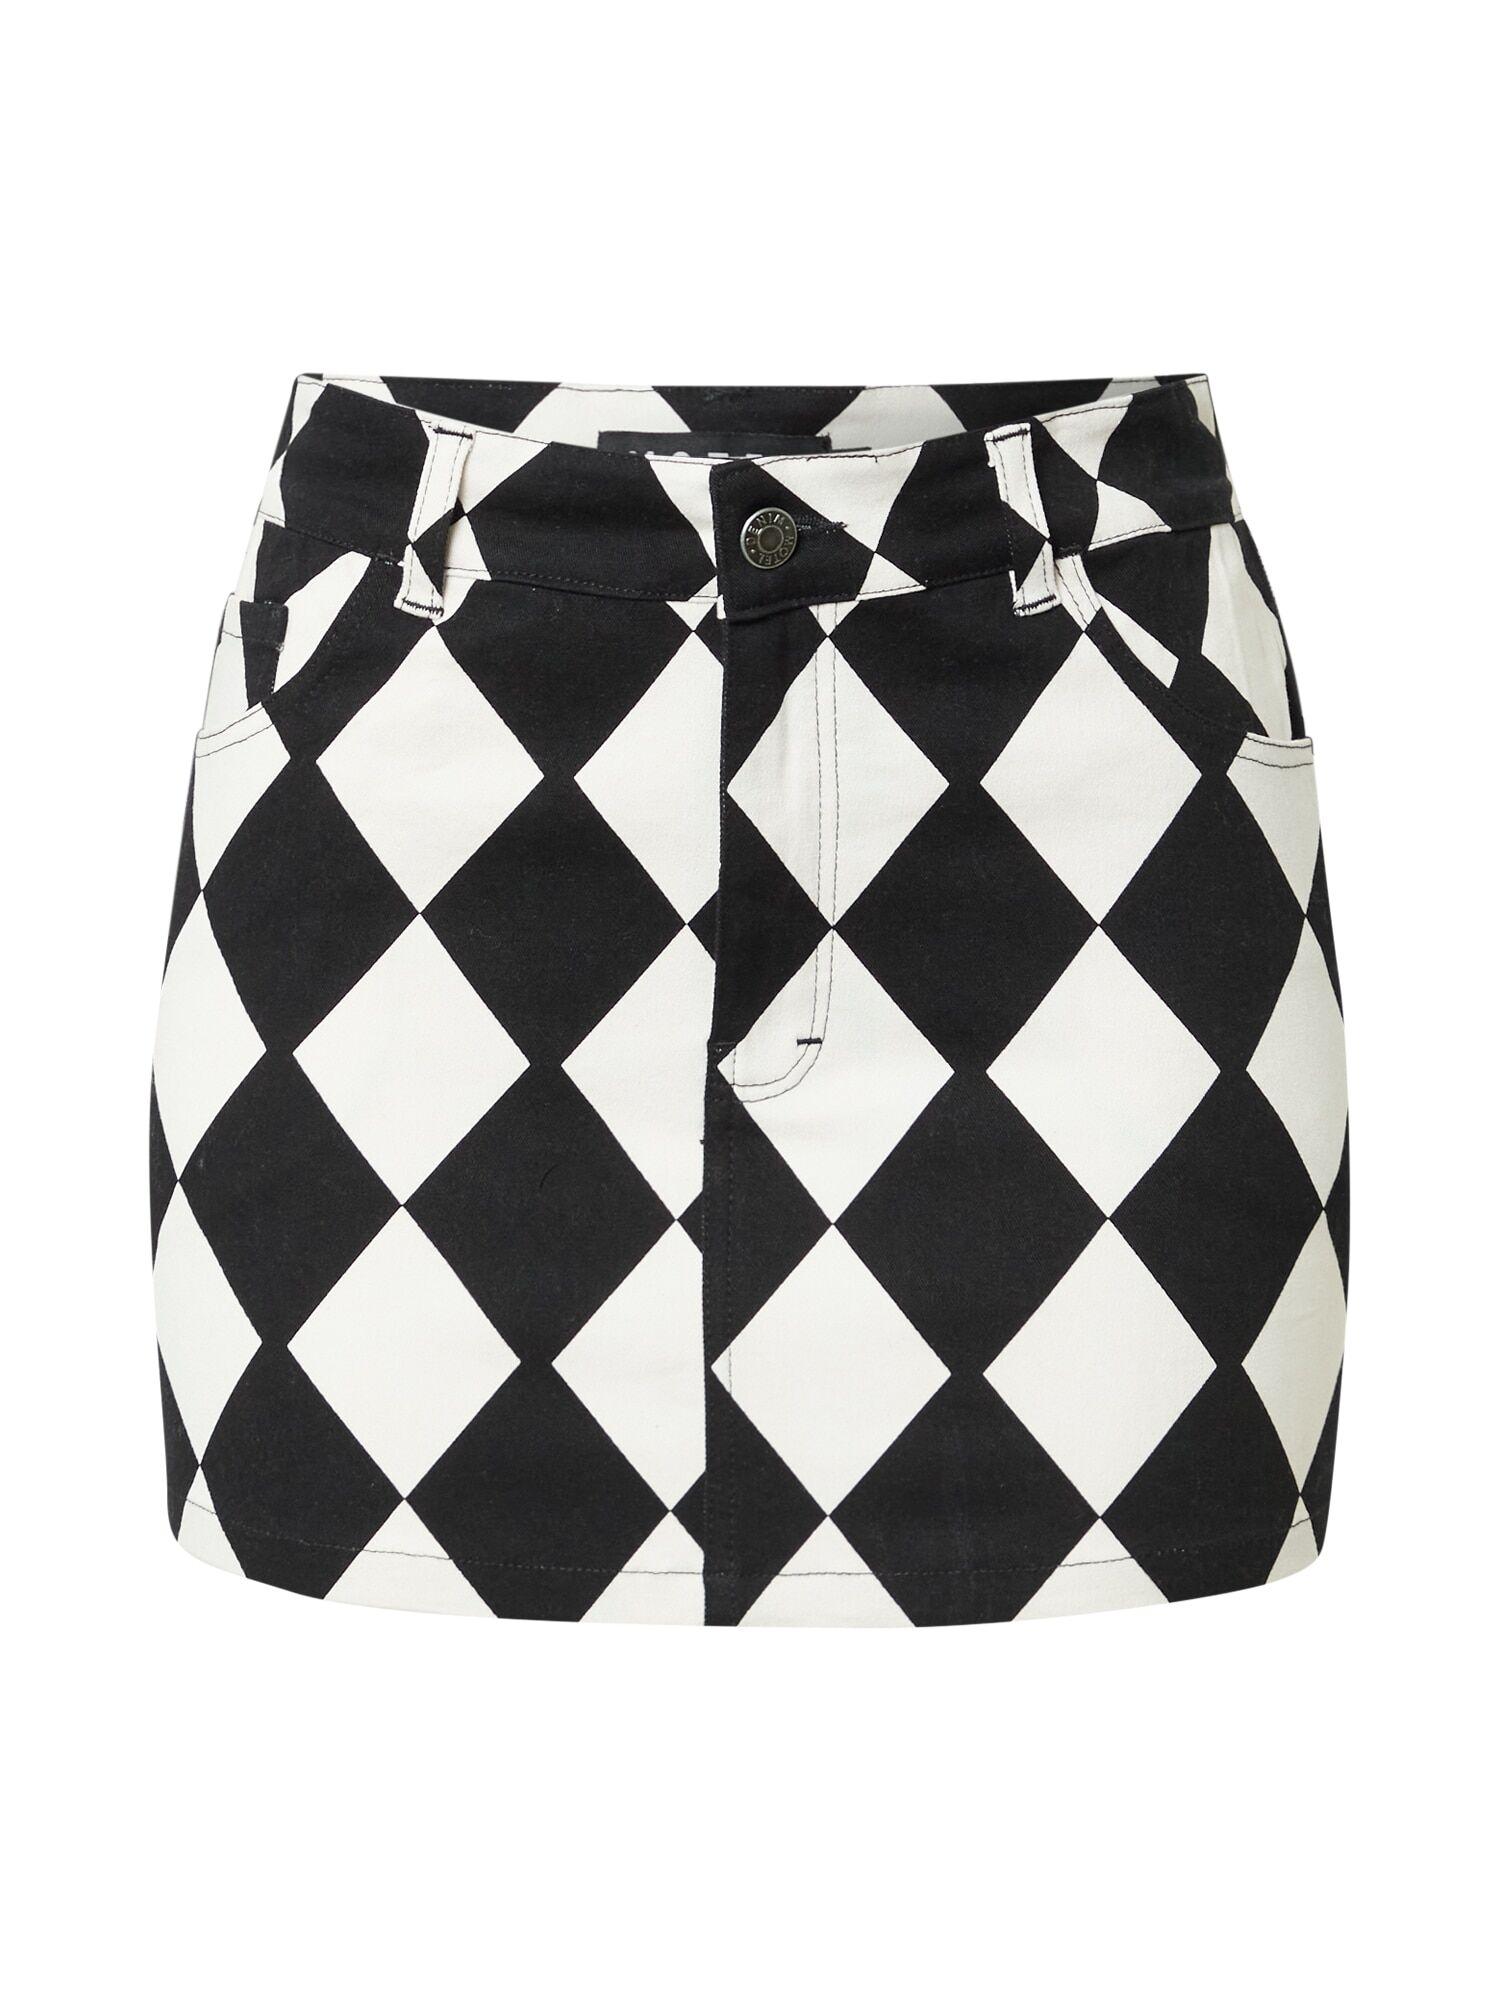 Motel Jupe 'Micro Broomy'  - Noir, Blanc - Taille: XL - female